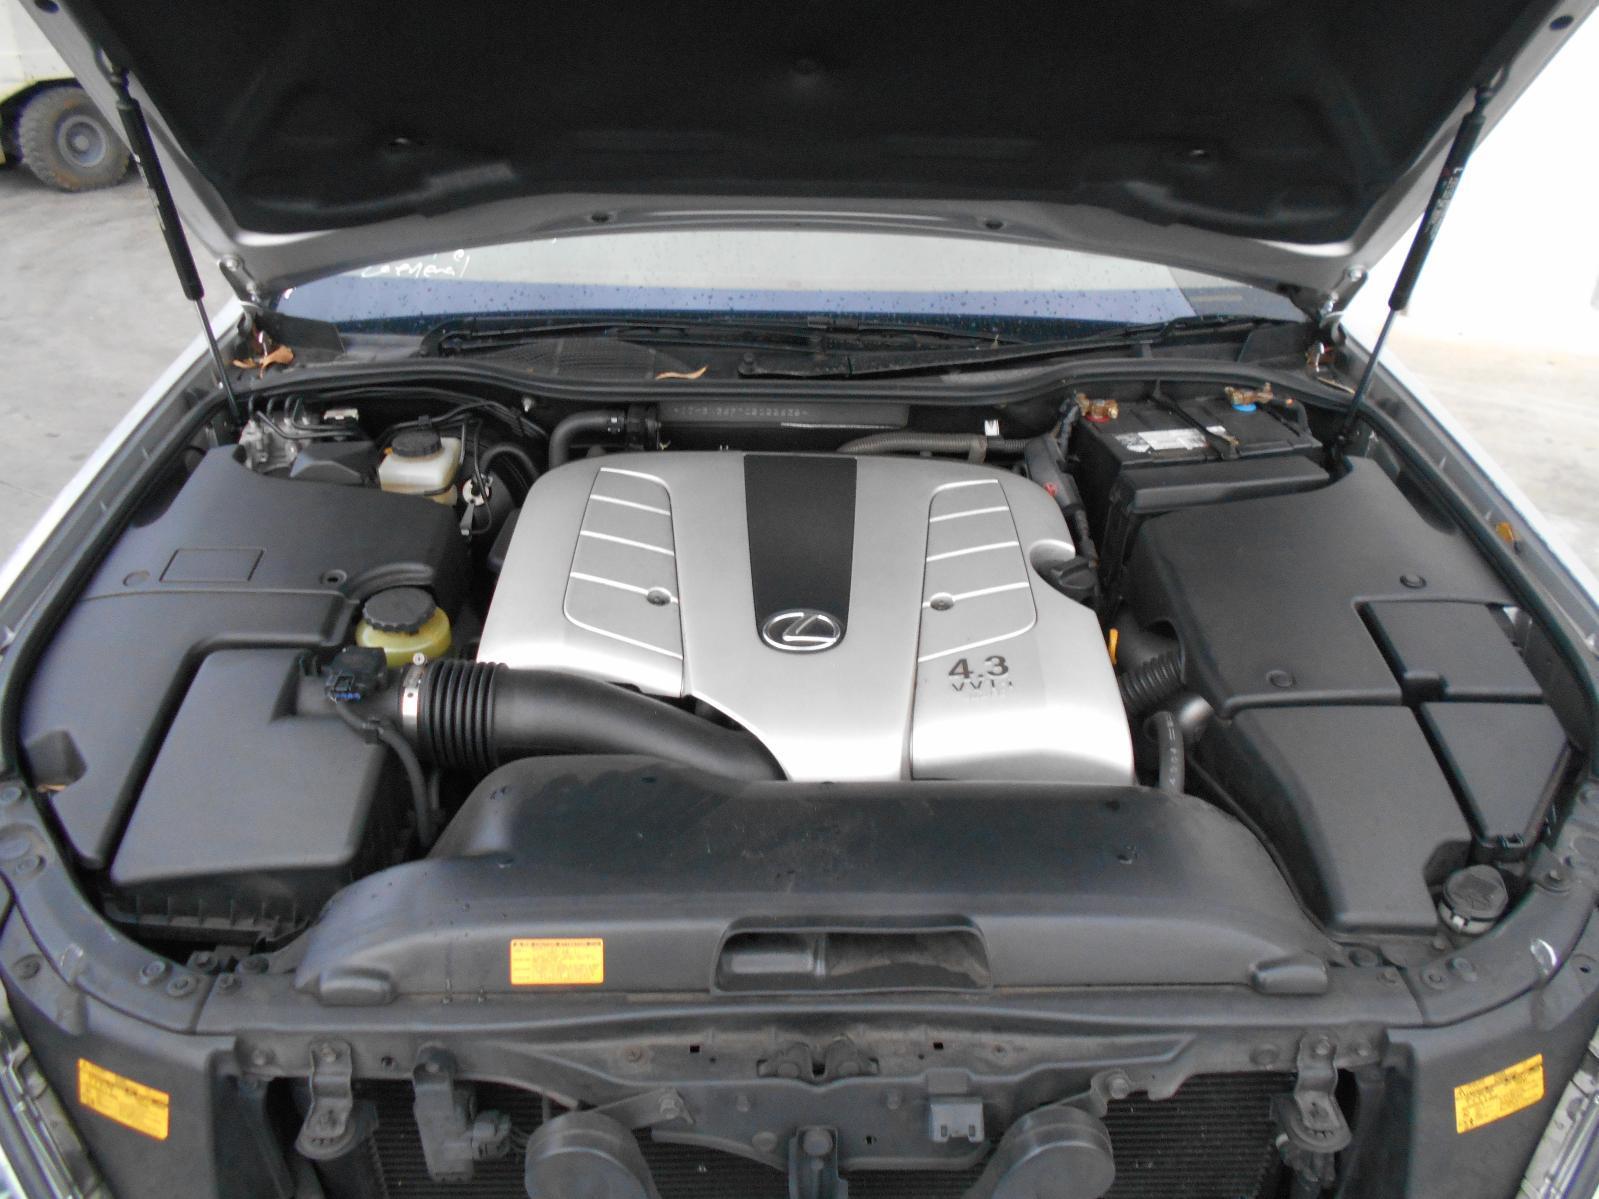 LEXUS LS430, Engine, PETROL, 4.3, 3UZ, UCF30R, 12/00-03/07